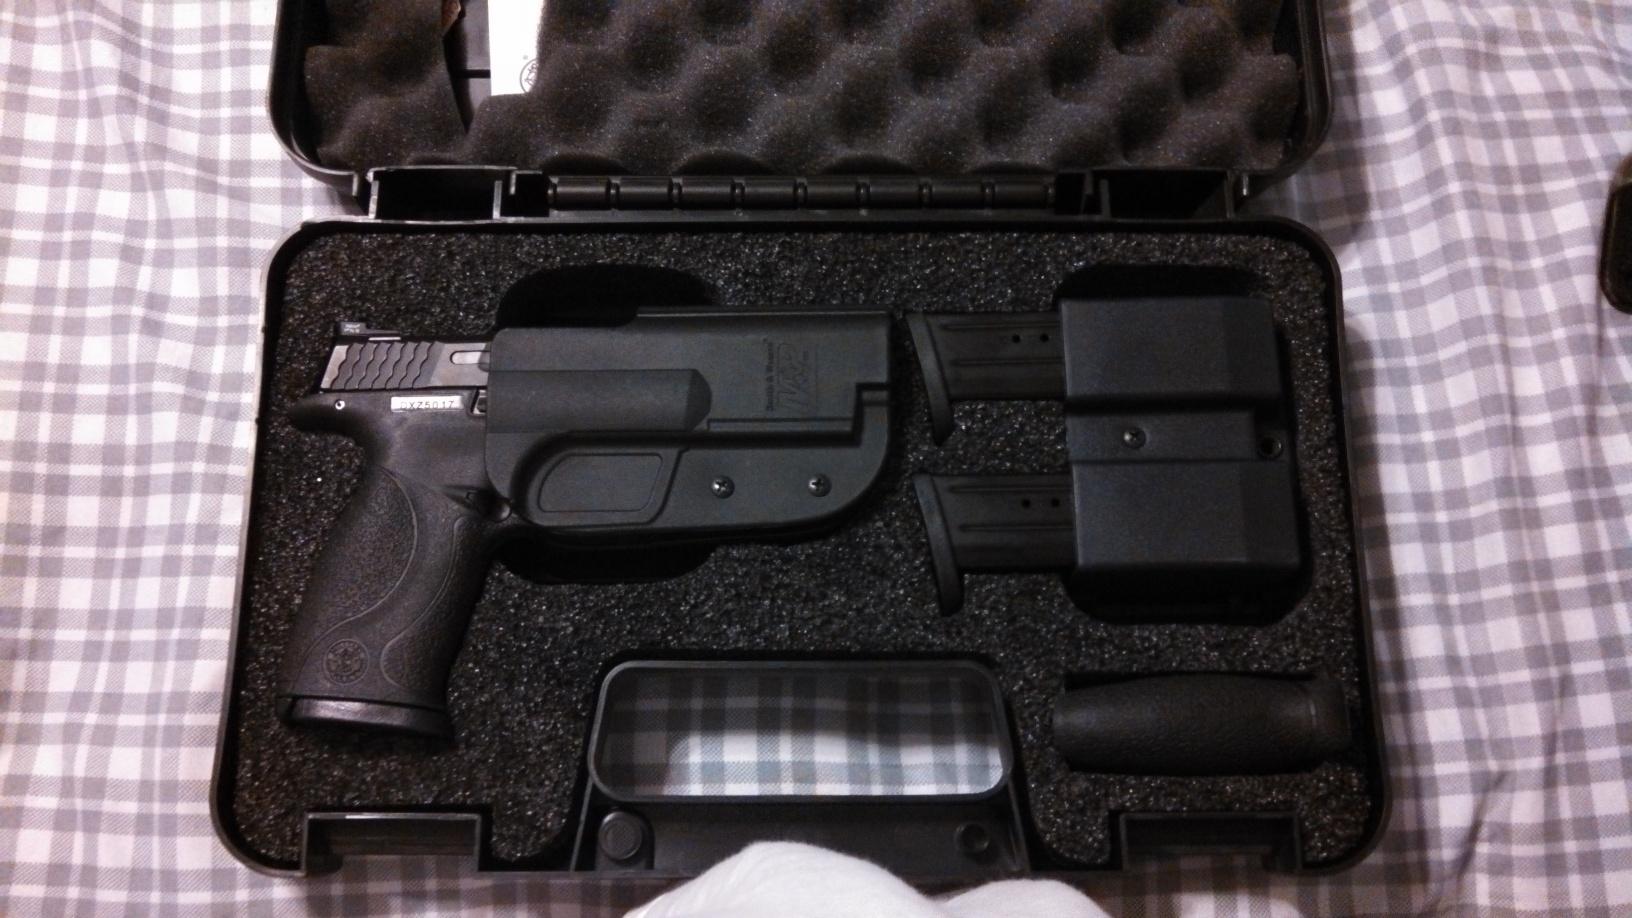 WTS:  Full size 9mm M&P-img_20140529_134317_488.jpg